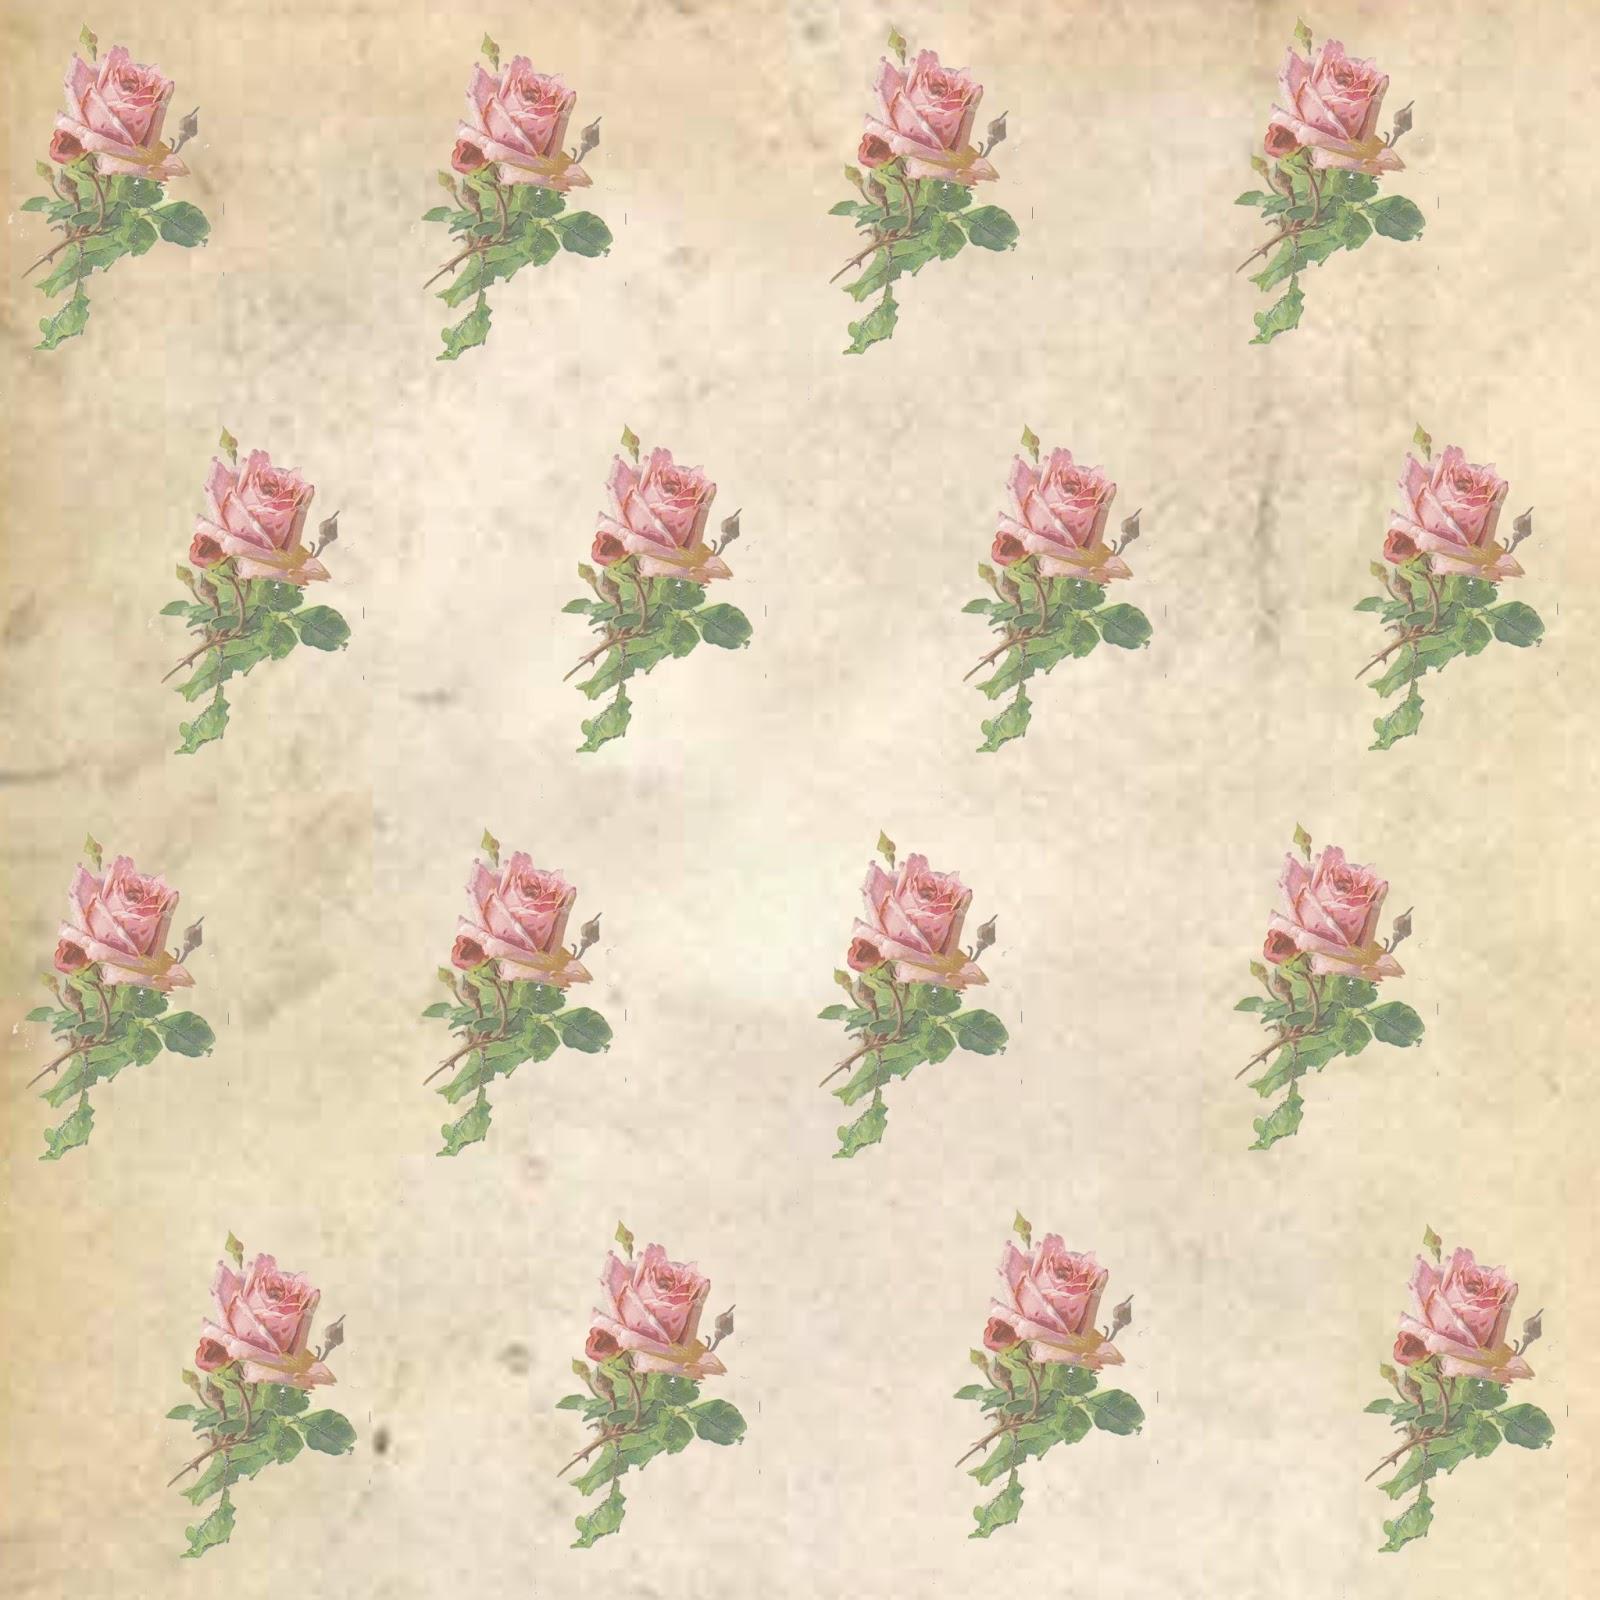 5 Images of Printable Vintage Pink Roses